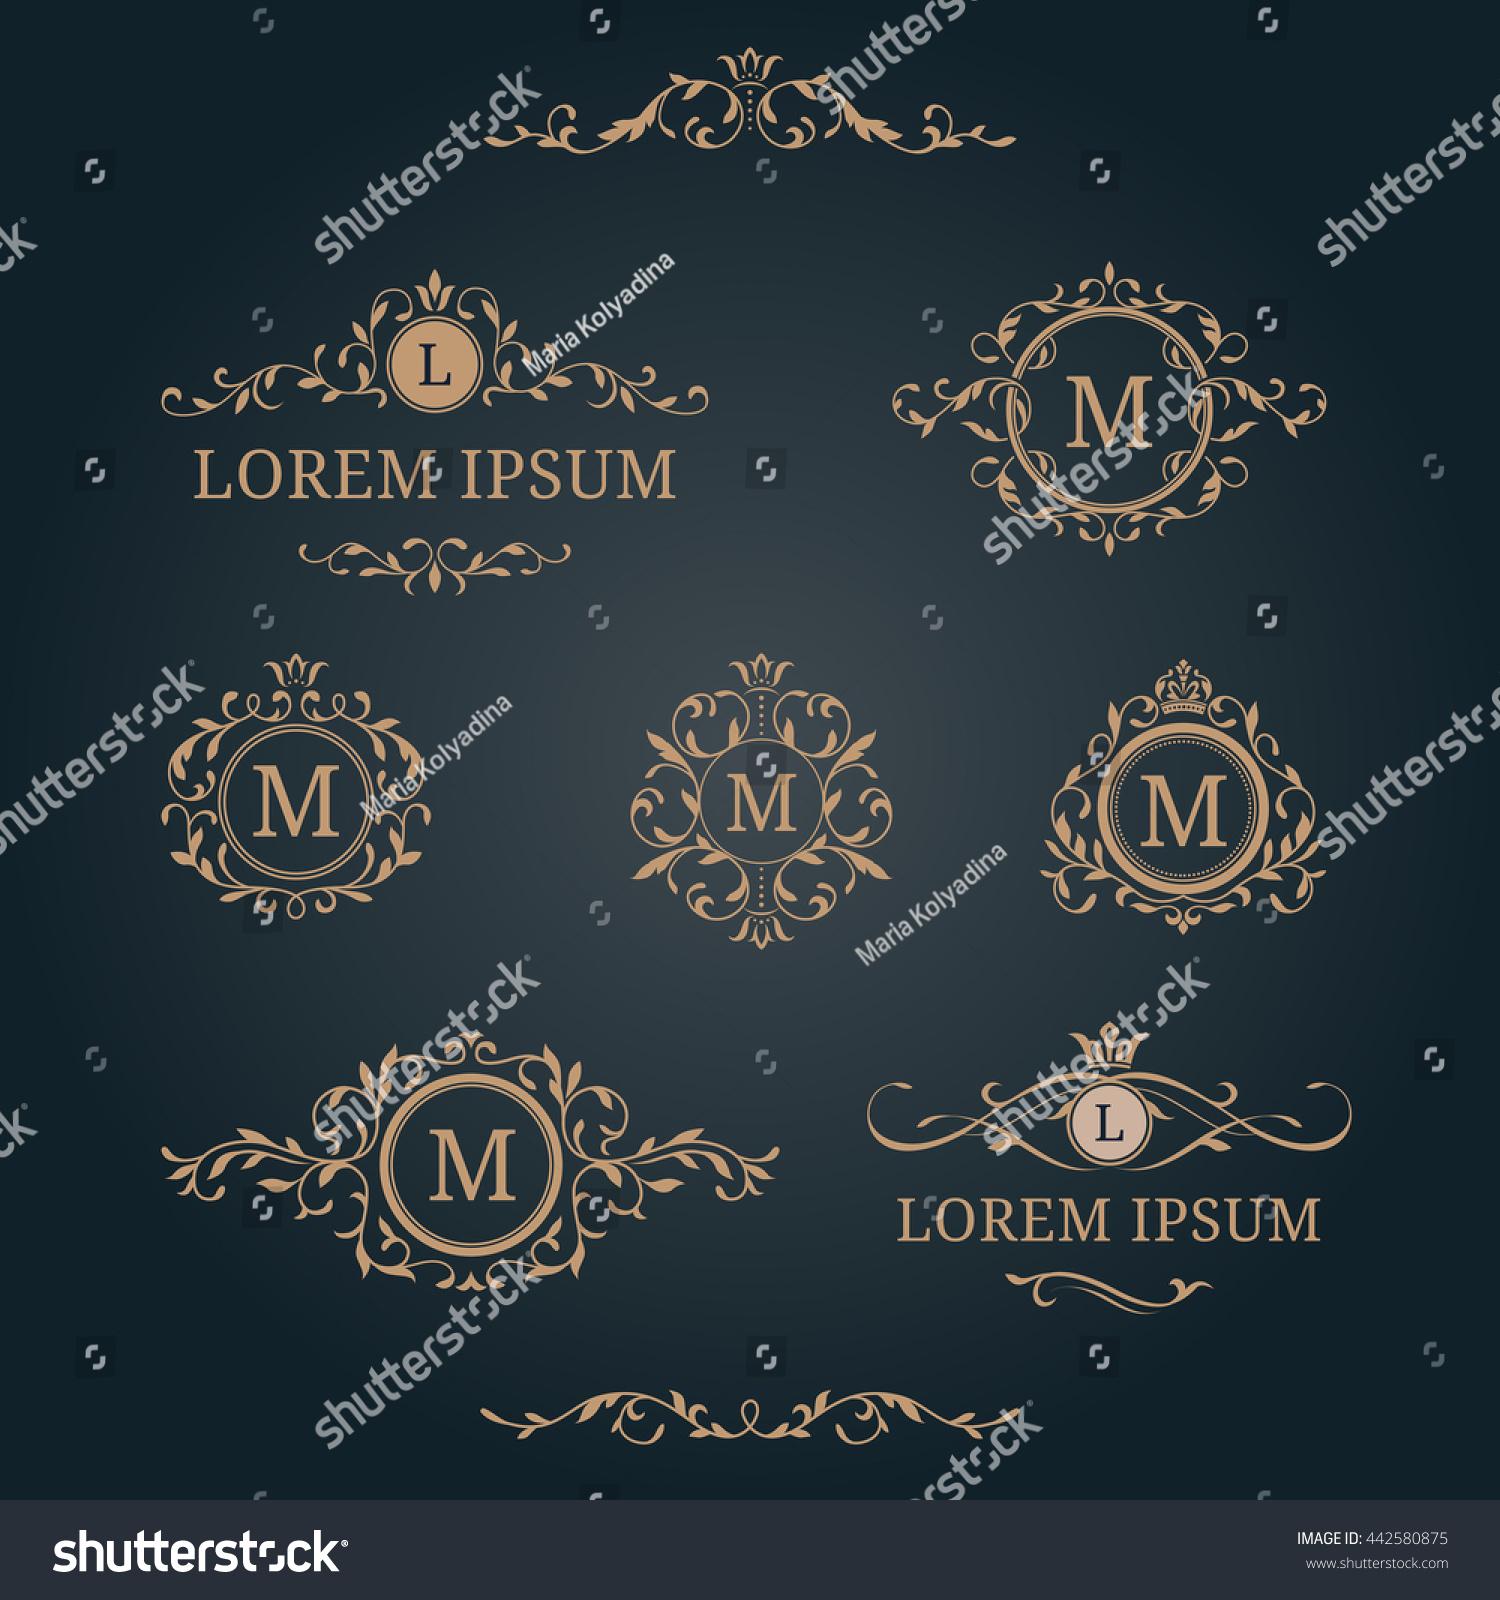 Elegant Floral Monograms Borders Design Templates Stock Illustration ...